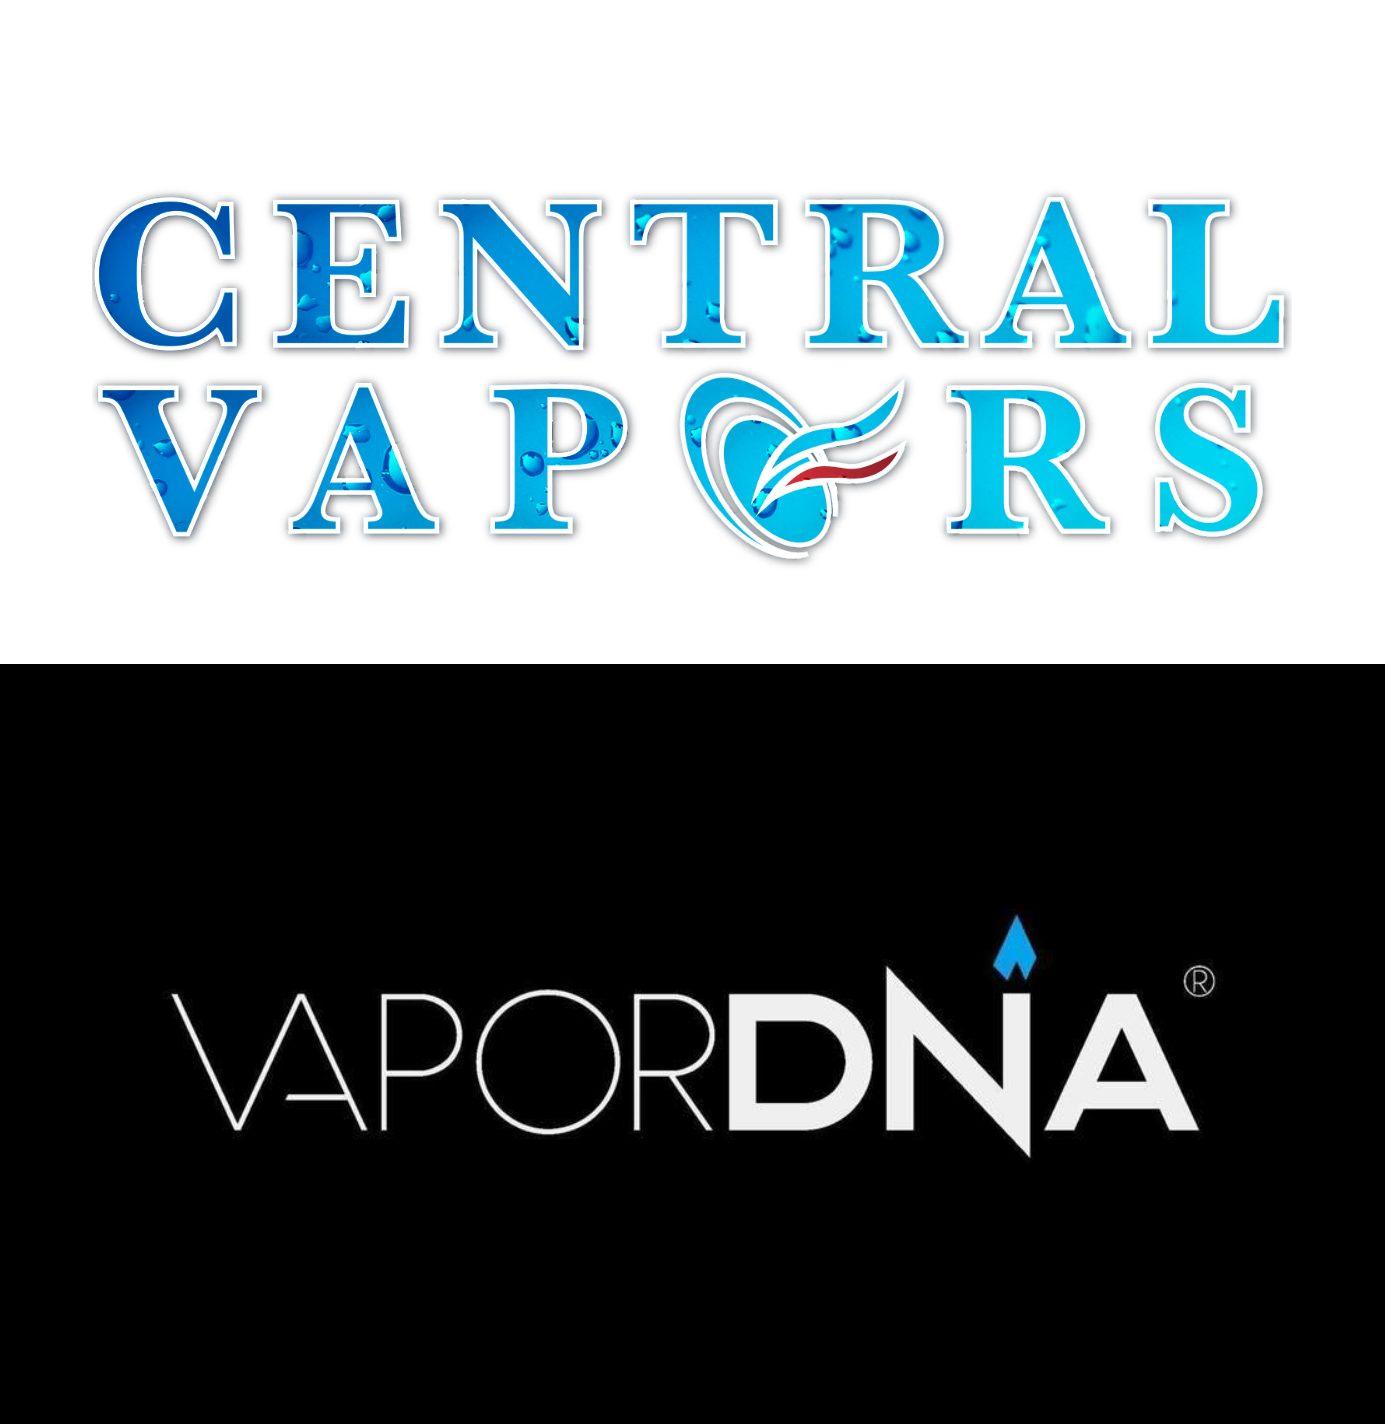 vapordna vs central vapors